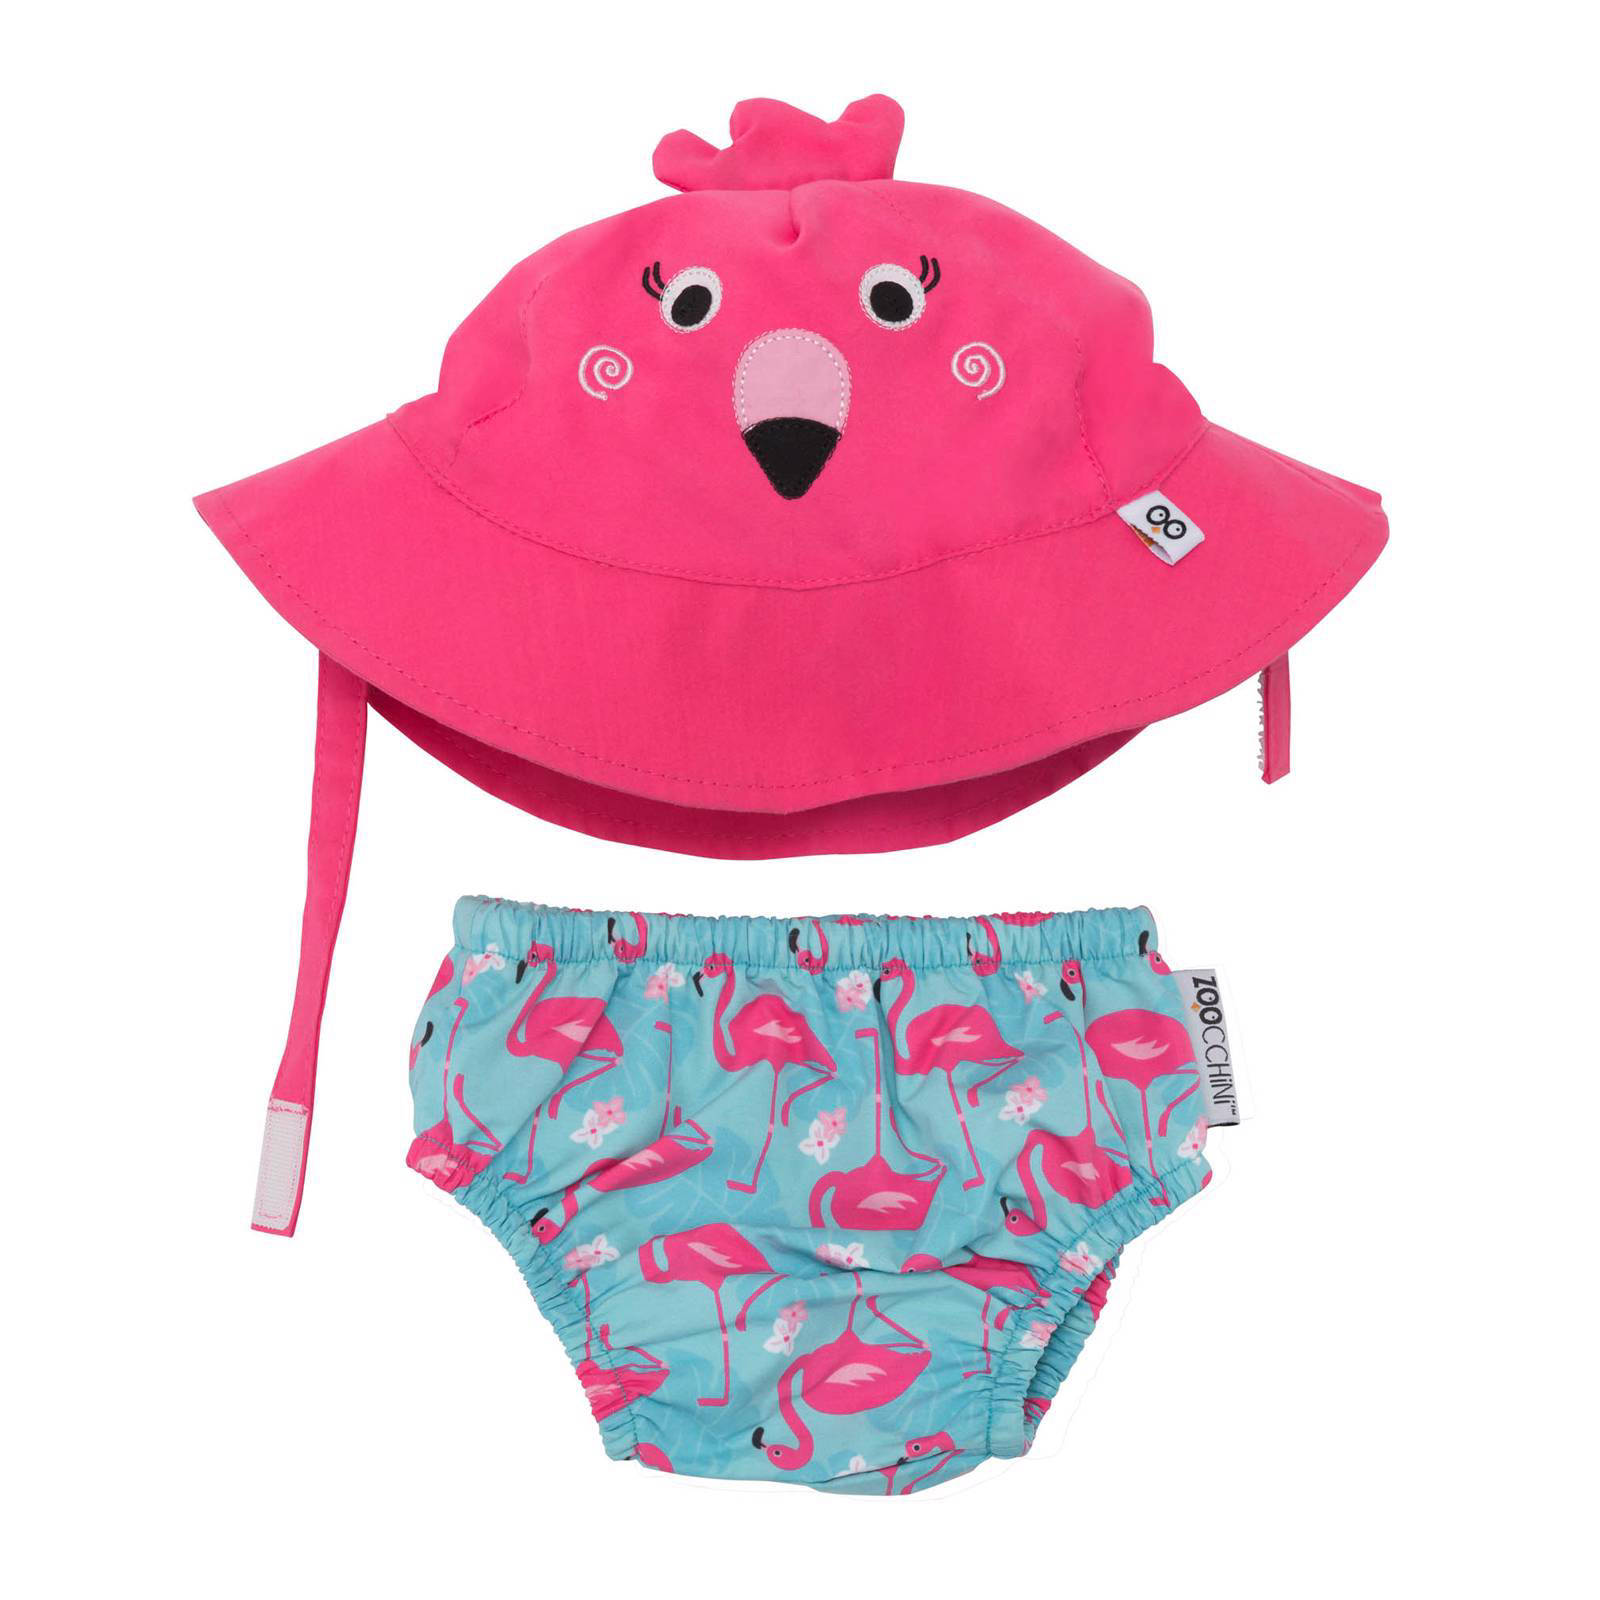 Zoocchini Franny the flamingo zwemluier + zonnehoedje maat S